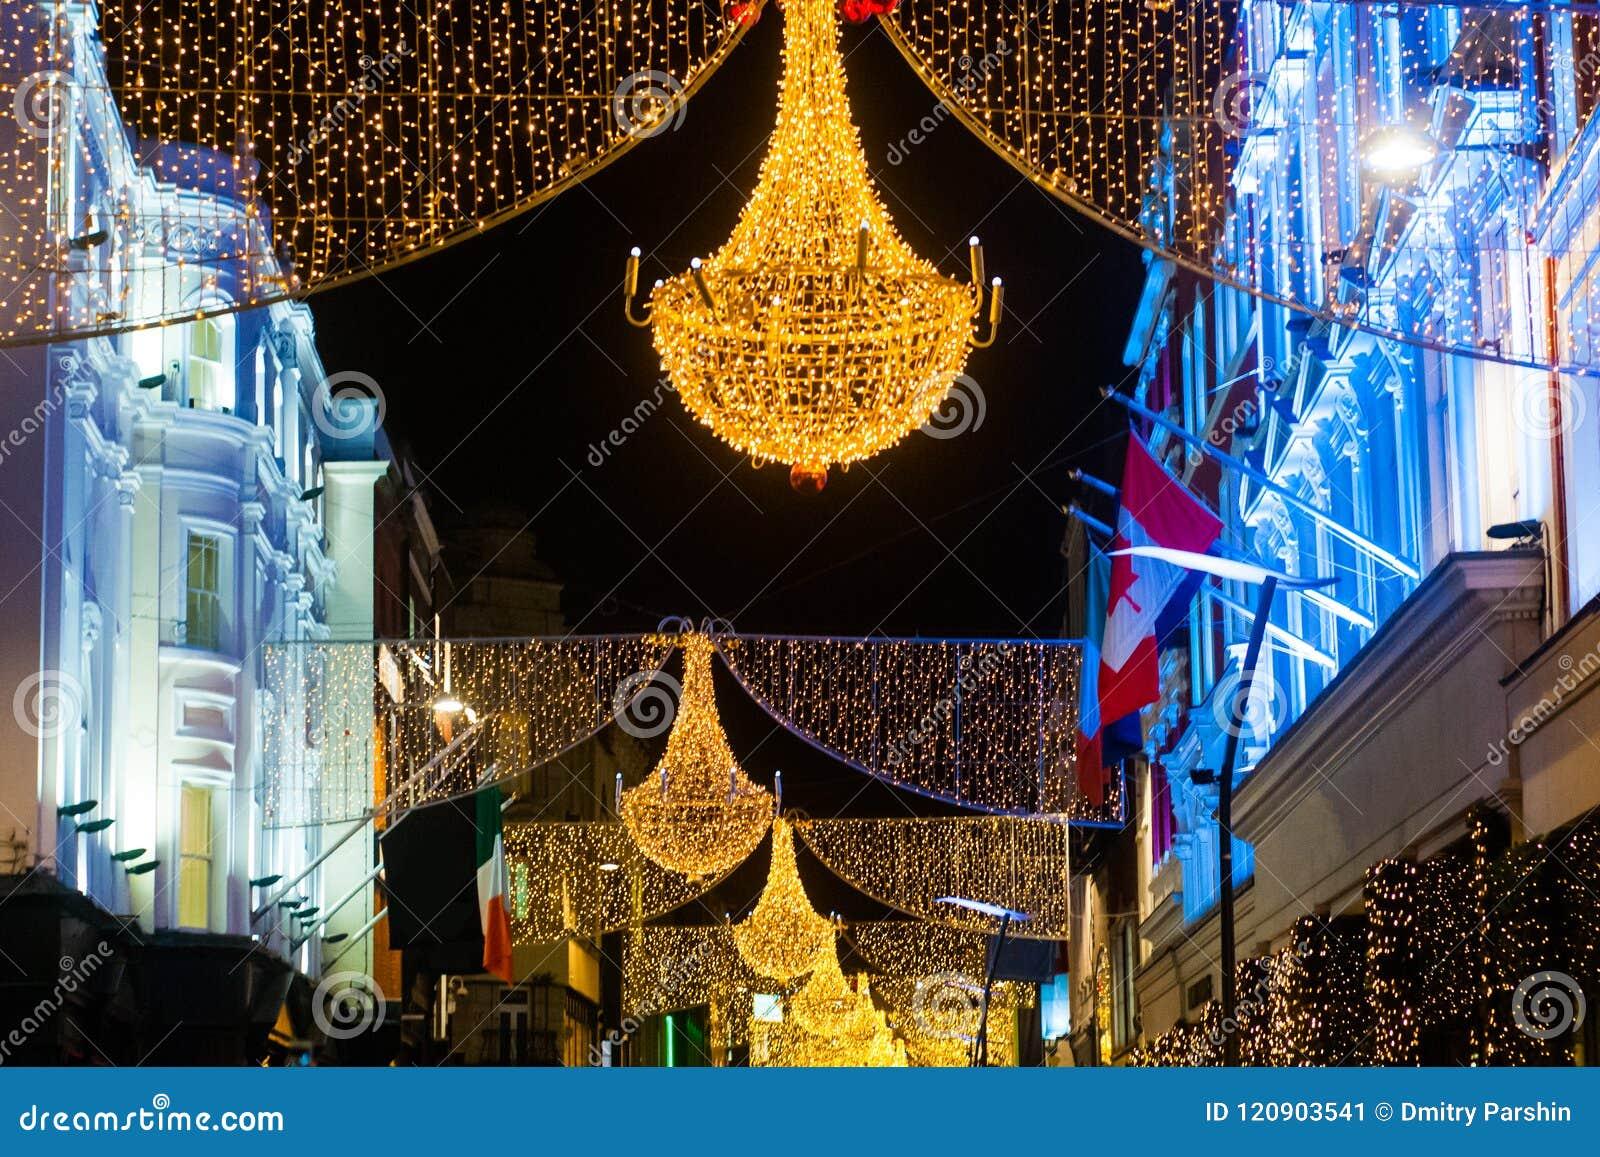 Christmas In Dublin Ireland.Grafton Street In Dublin Christmas Light The Inscription